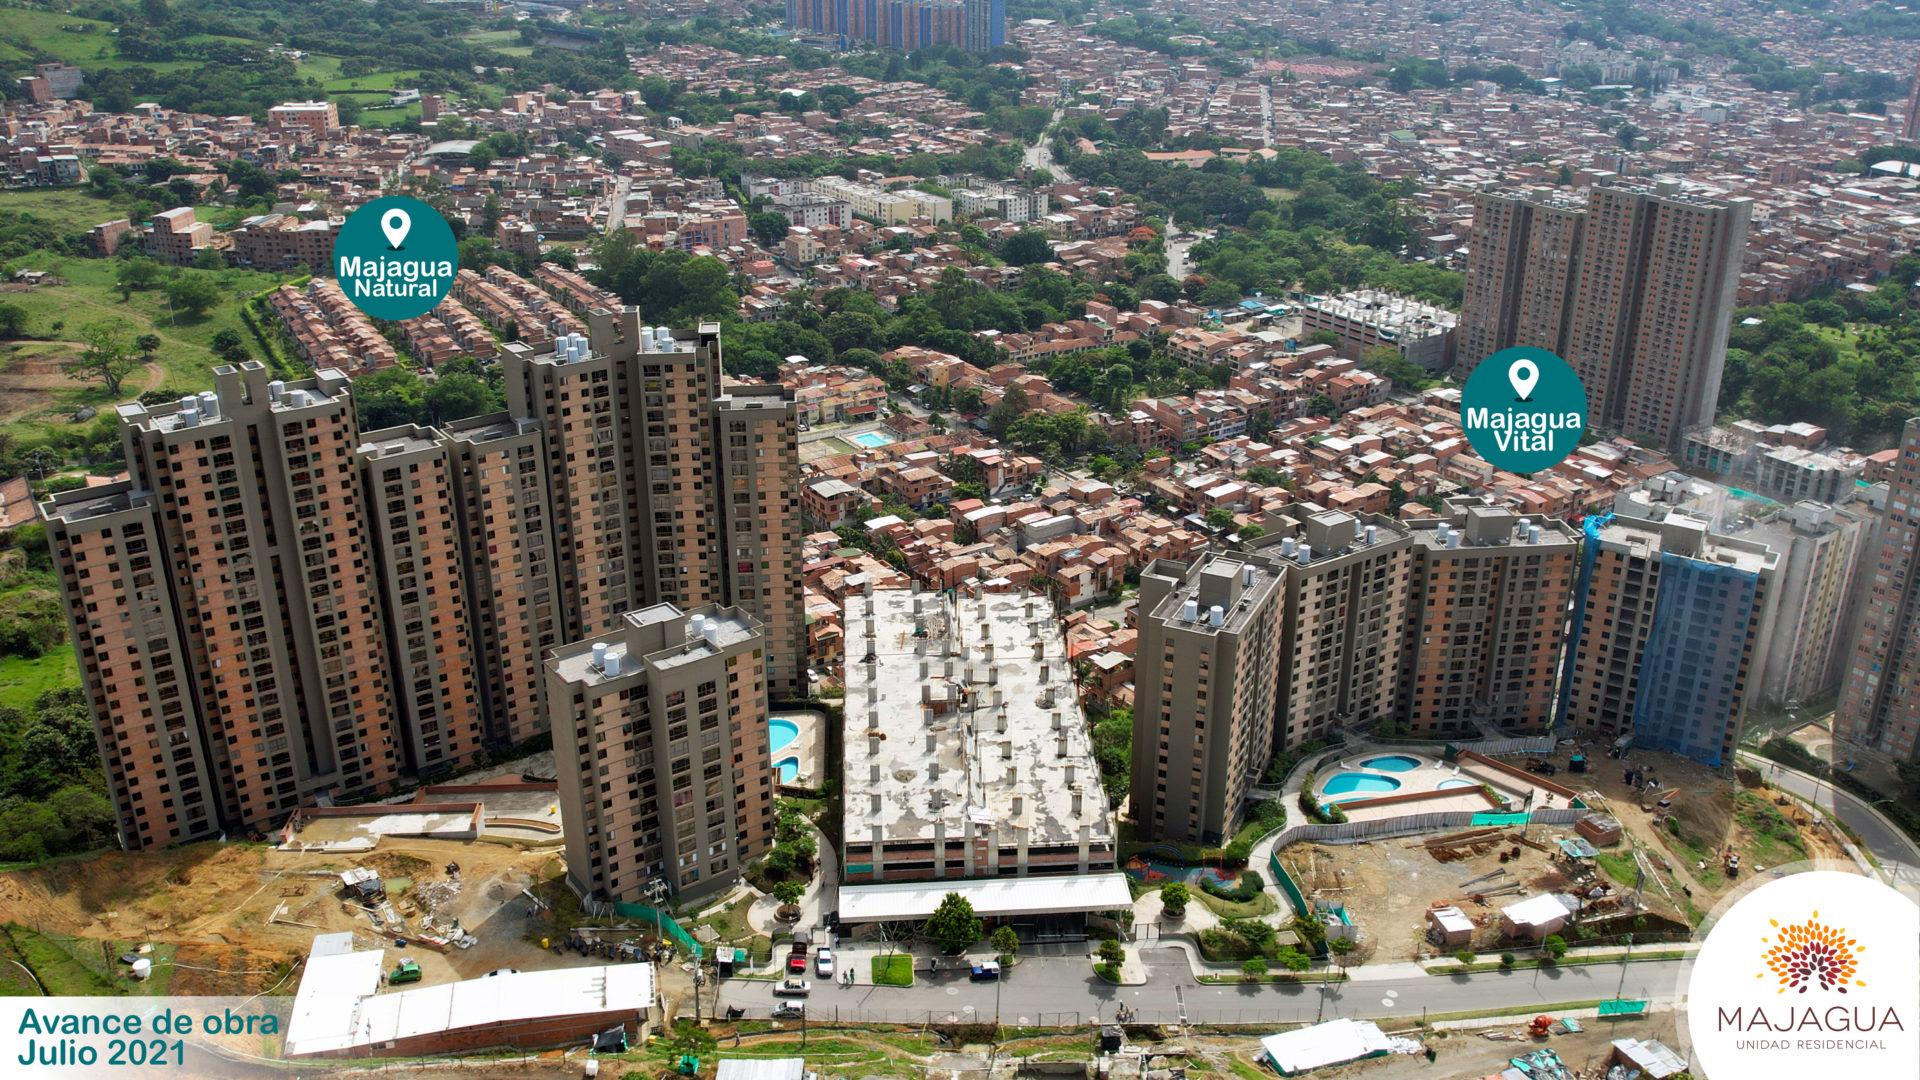 Avance de obra Majagua - Majagua, Venta de Apartamentos y Apartaestudios en Bello, Antioquia